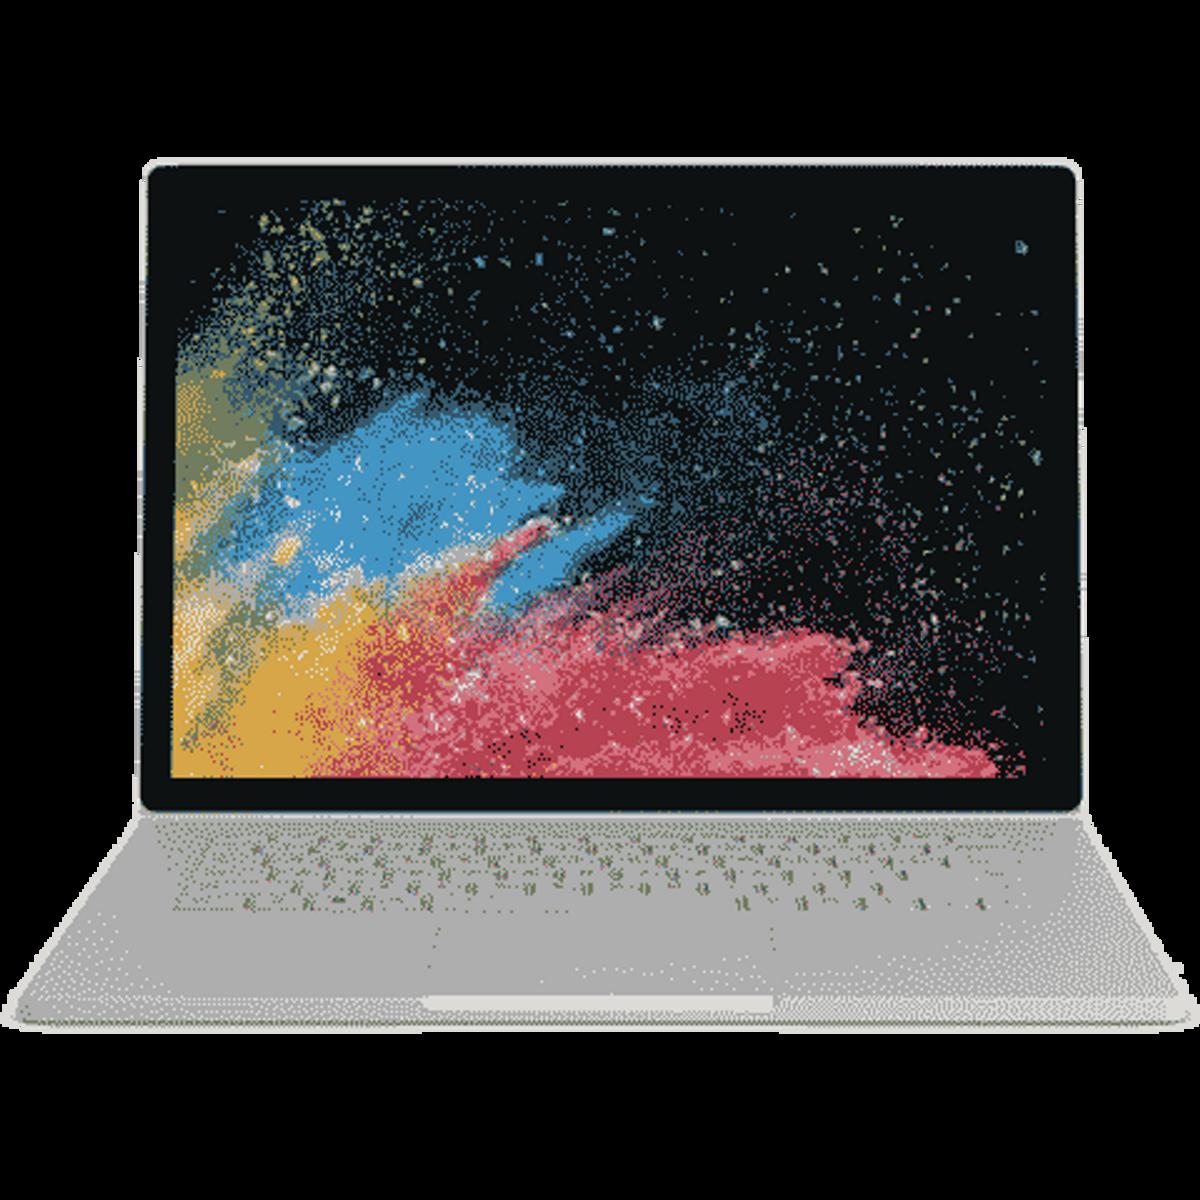 माइक्रोसॉफ्ट Surface Book 2 13.5 इंच